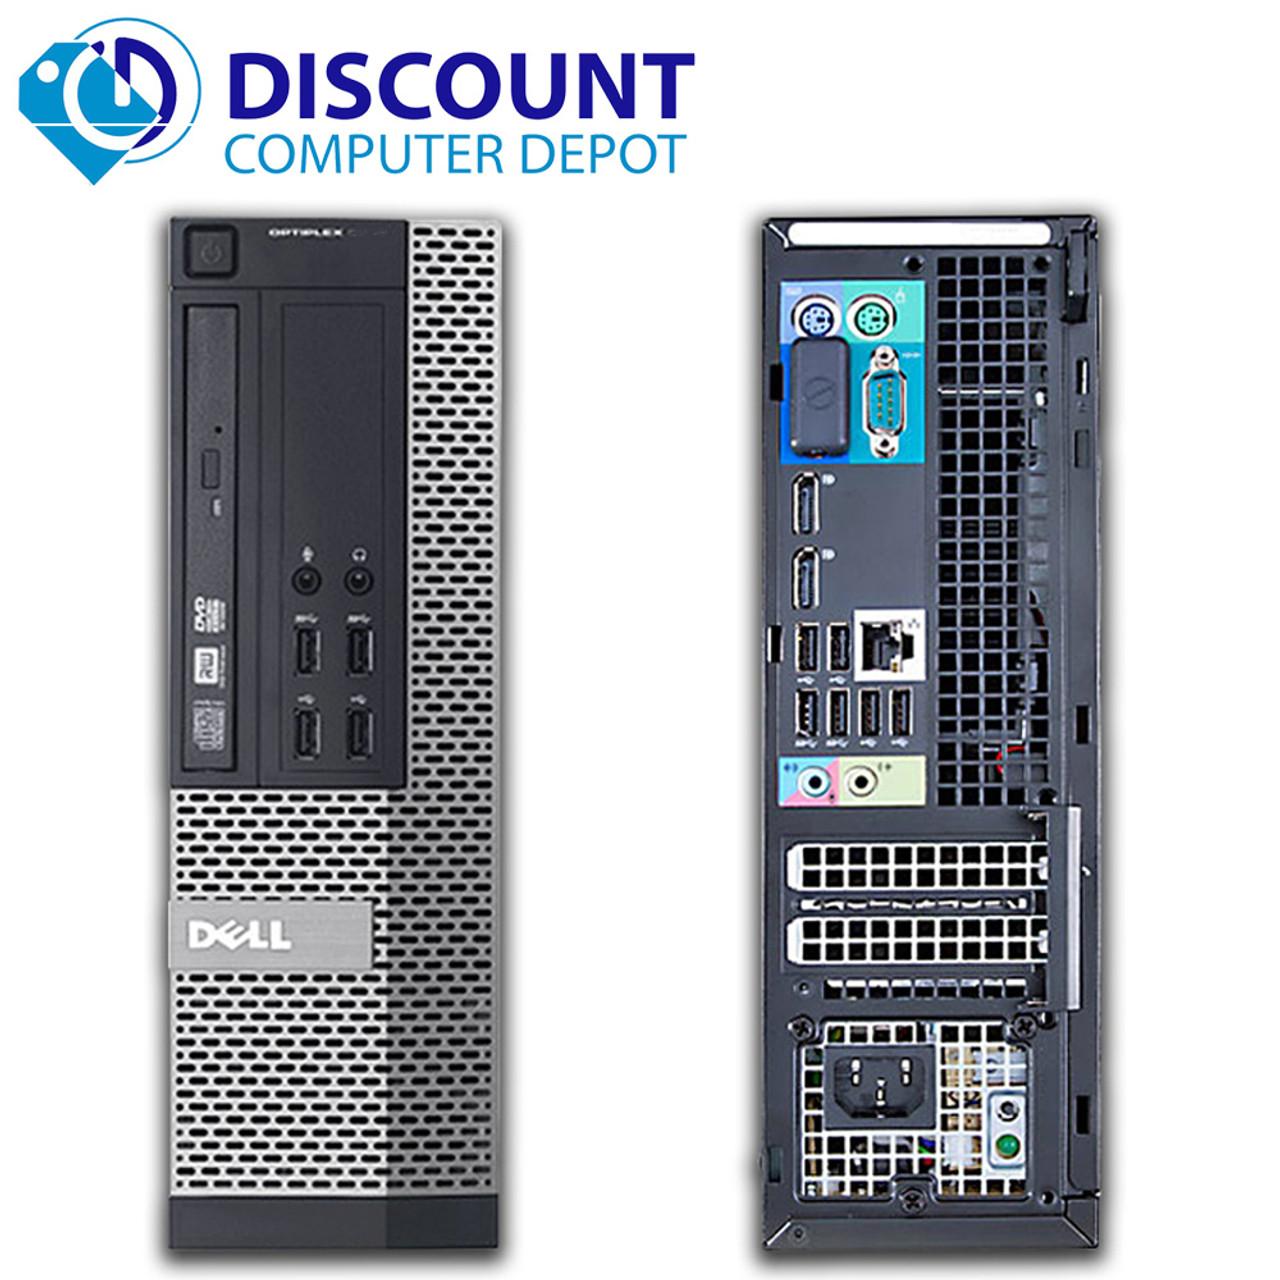 Dell Optiplex 990 Windows 10 Pro Desktop PC Quad i5 3 1GHz 8GB 500GB 20